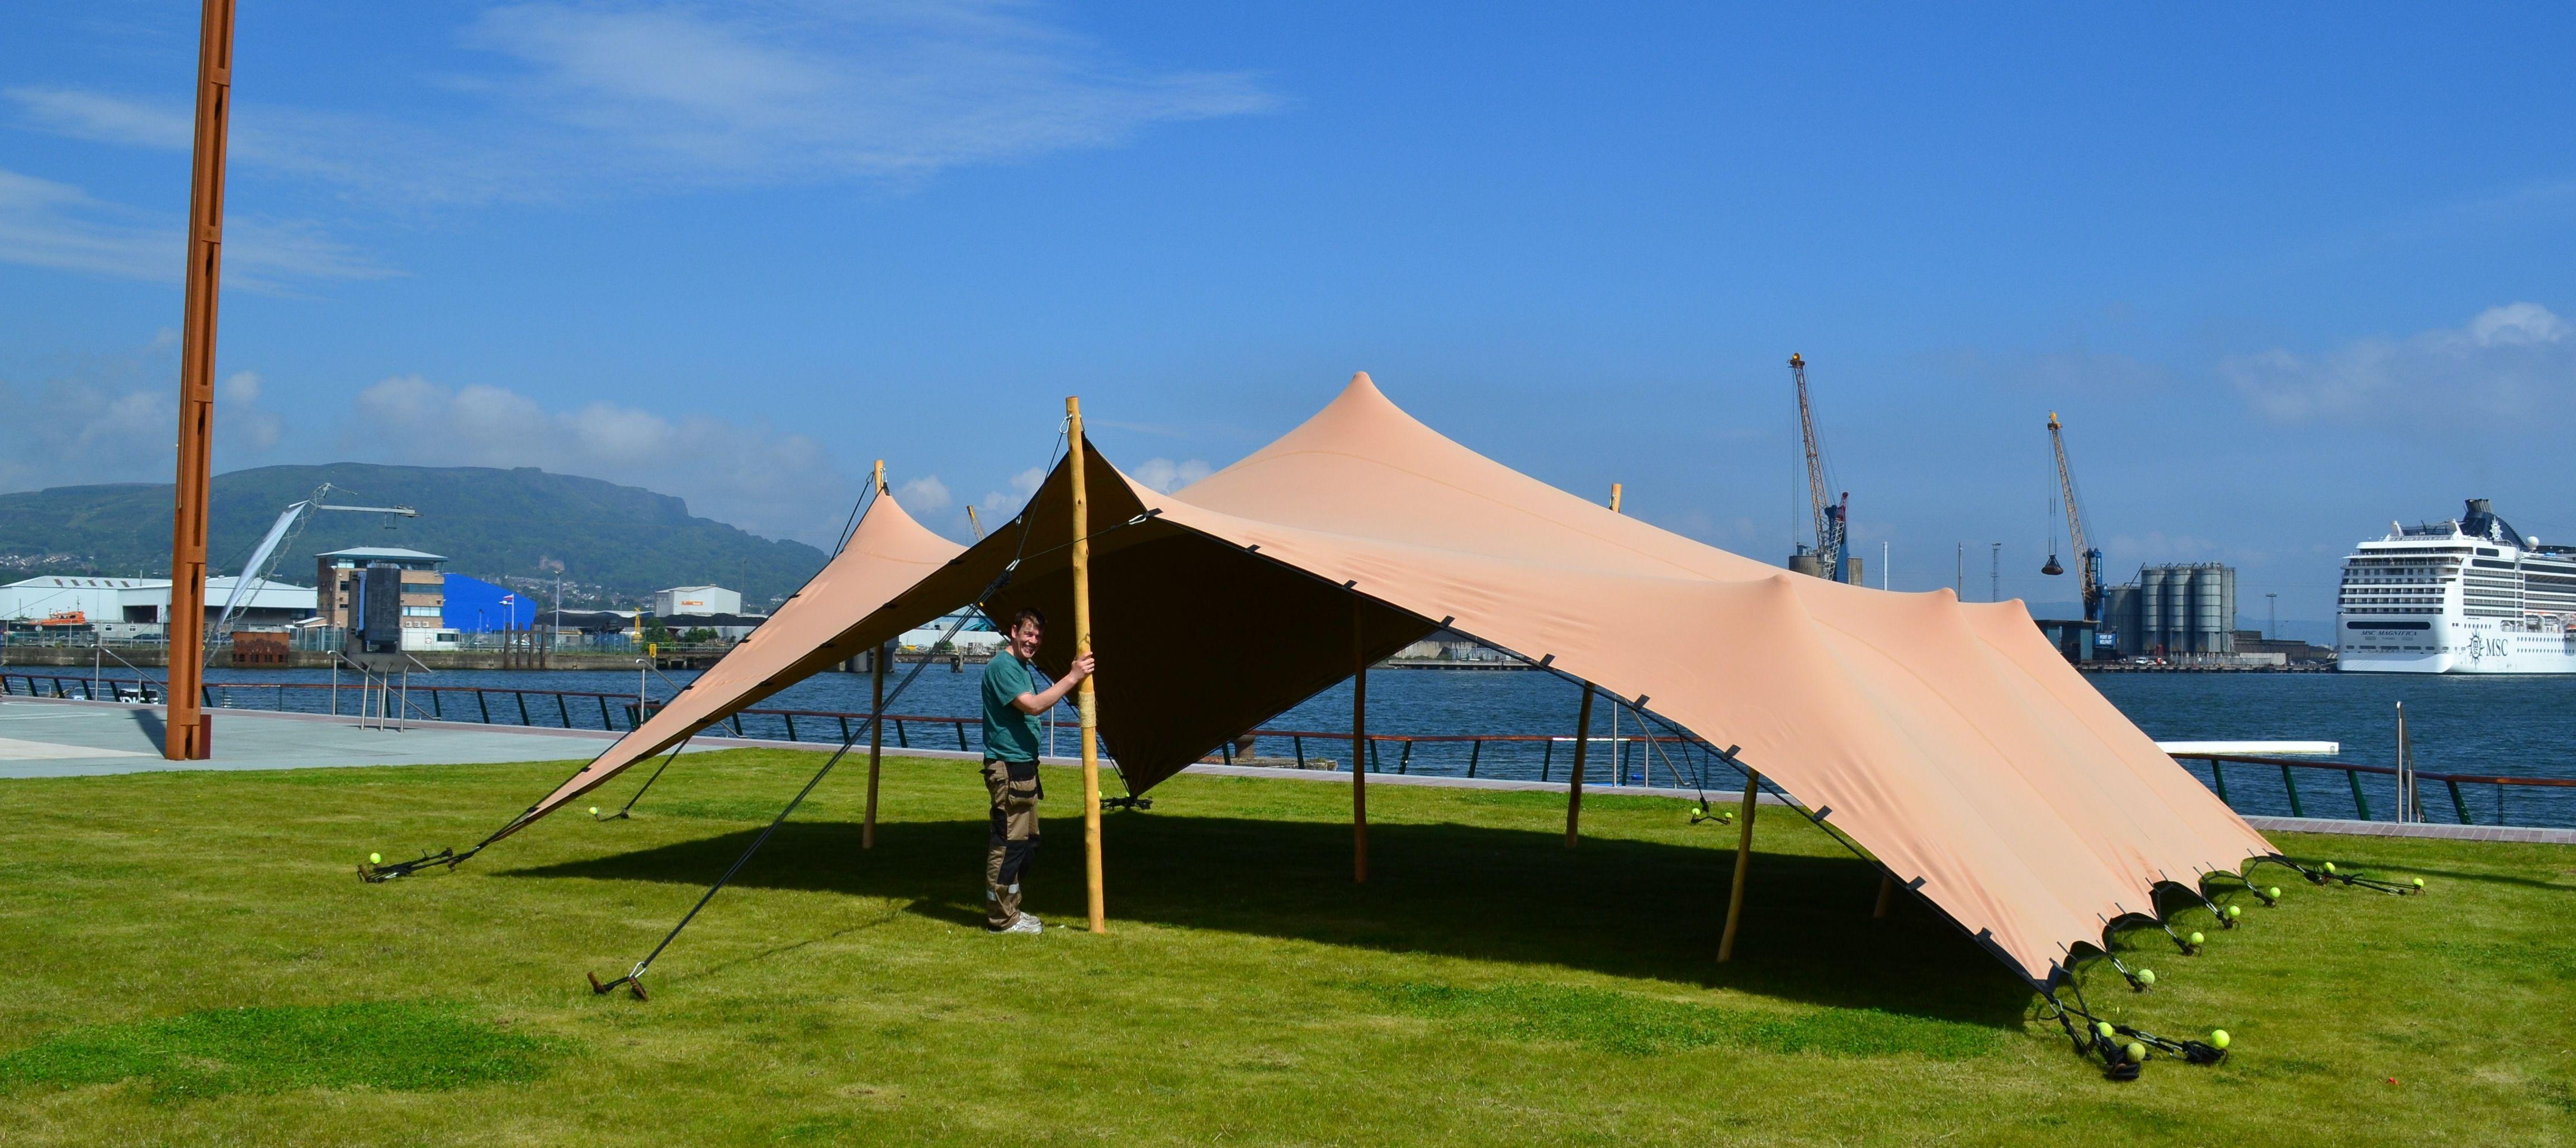 10m x 7.5m u0027Babyu0027 Biege Stretch Tent set up at Titanic Quarter Slipway & 10m x 7.5m u0027Babyu0027 Biege Stretch Tent set up at Titanic Quarter ...